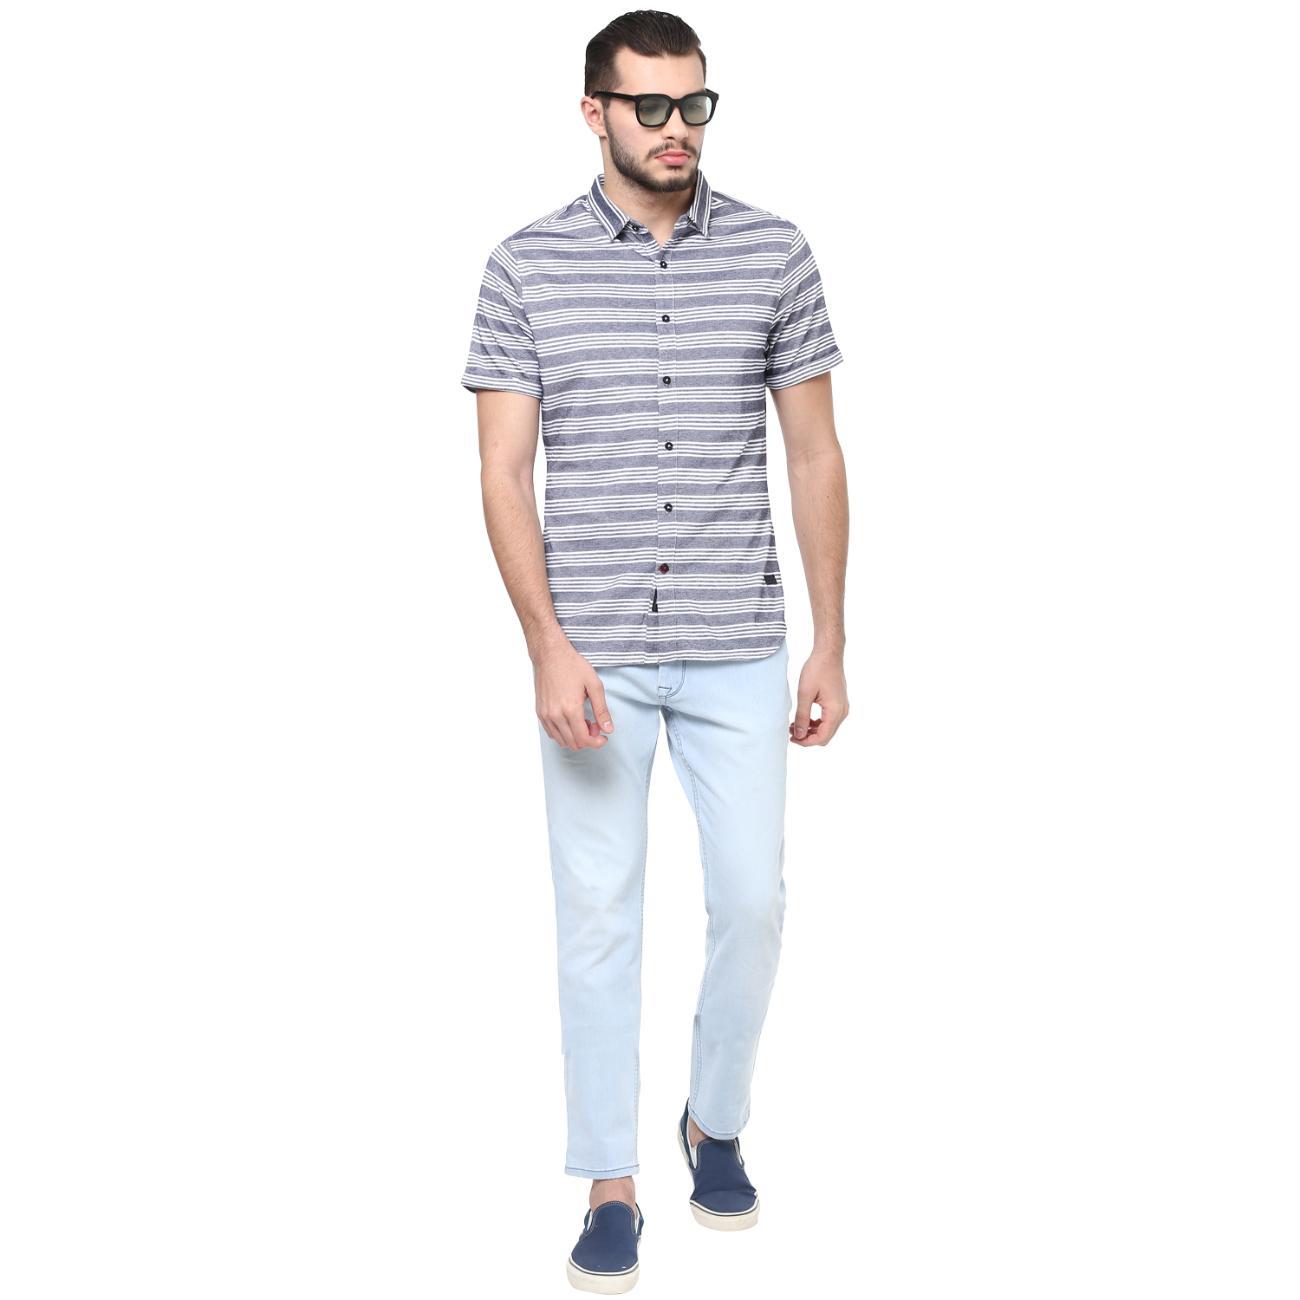 Mens Shirts for Men